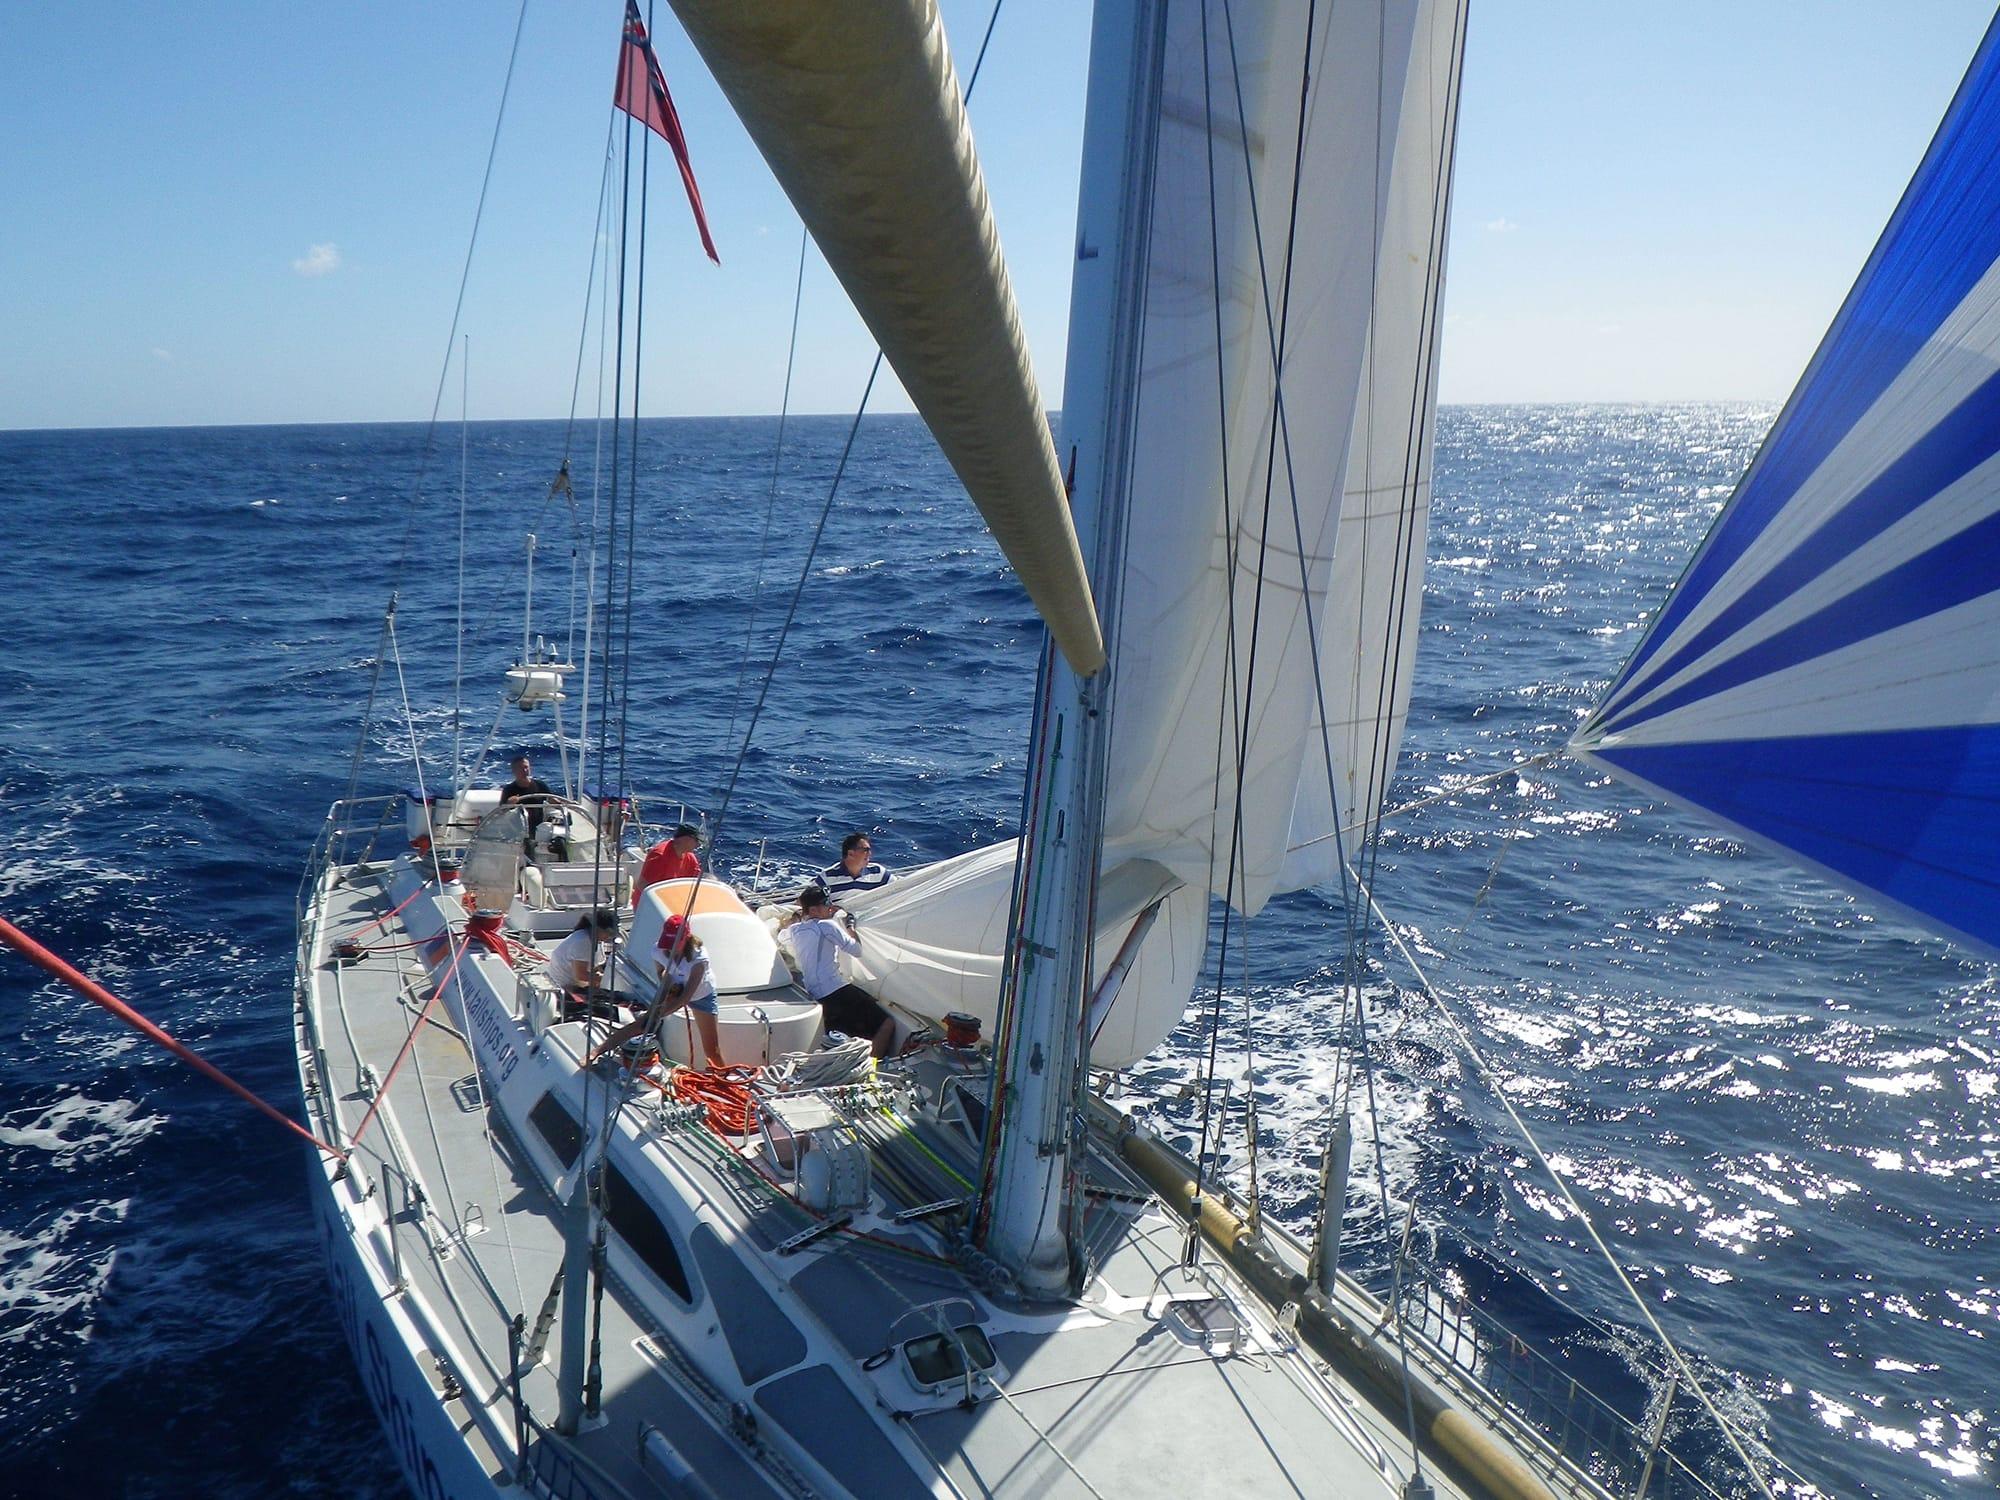 ARC Sailing